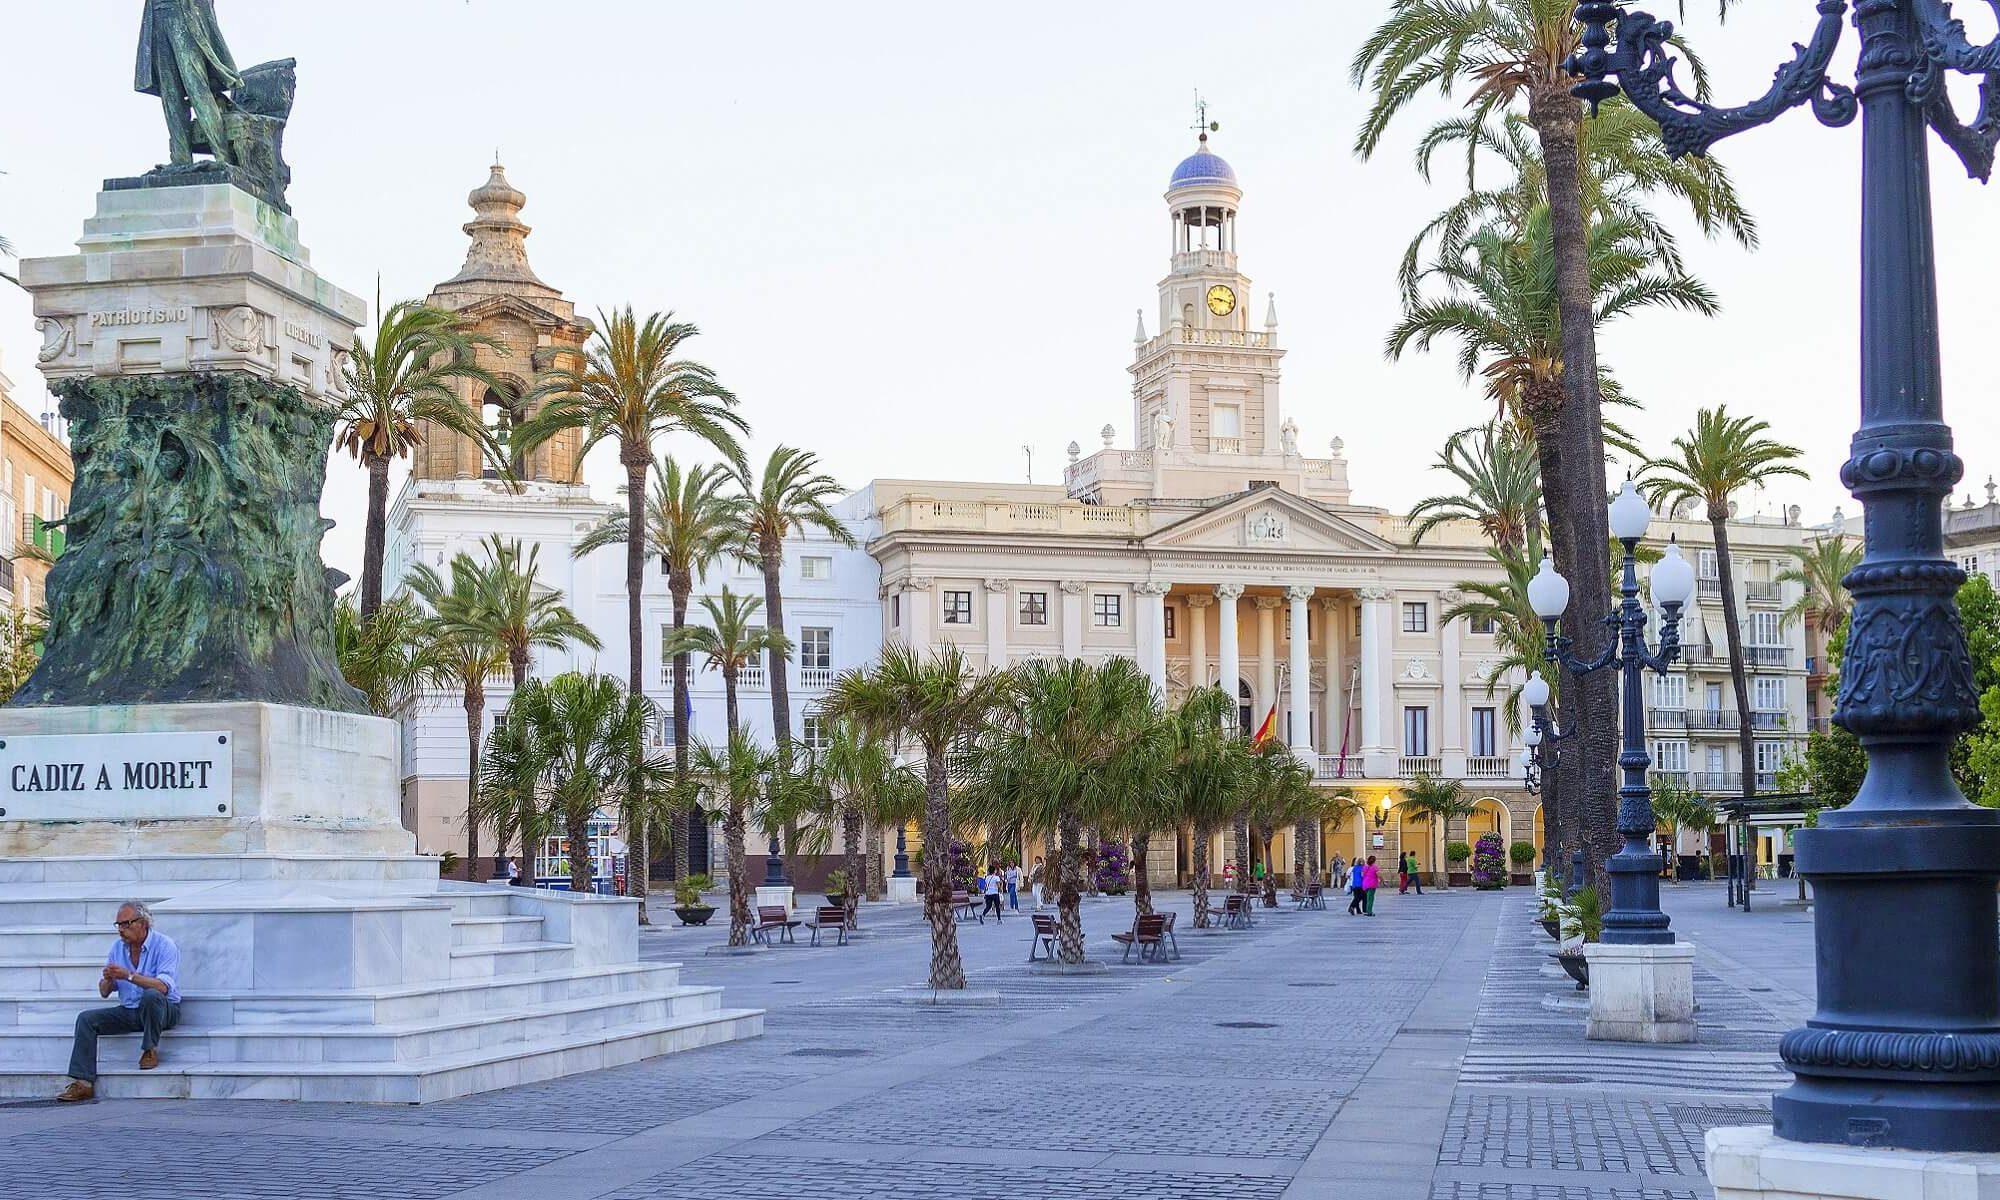 Das Rathaus in Cadiz